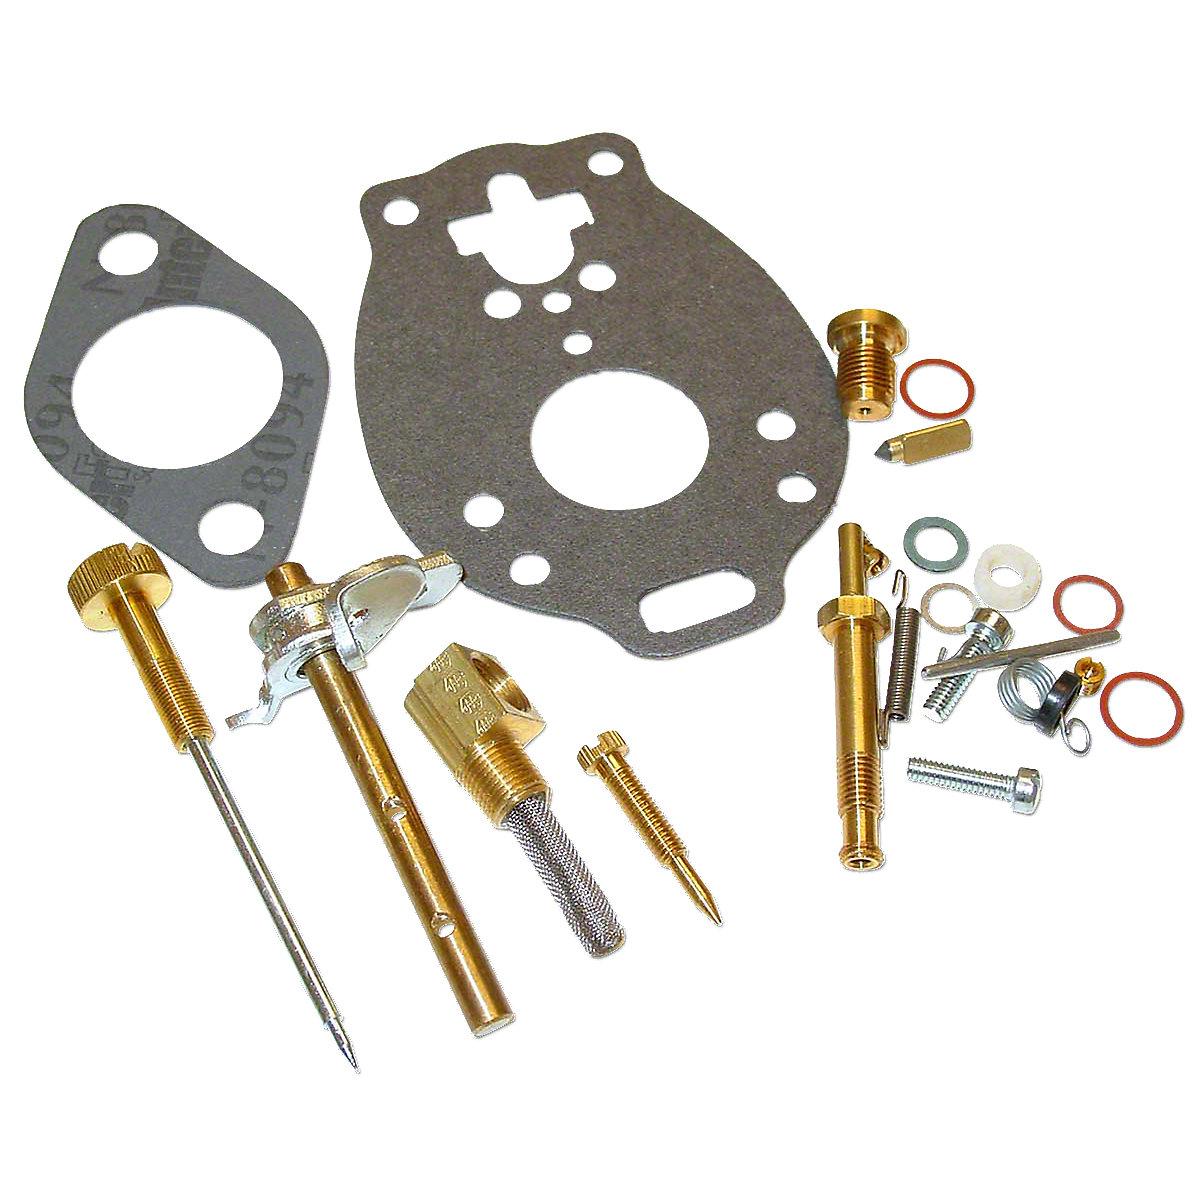 Marvel Carb 135 Massey : Marvel schebler carburetor kit for massey ferguson te